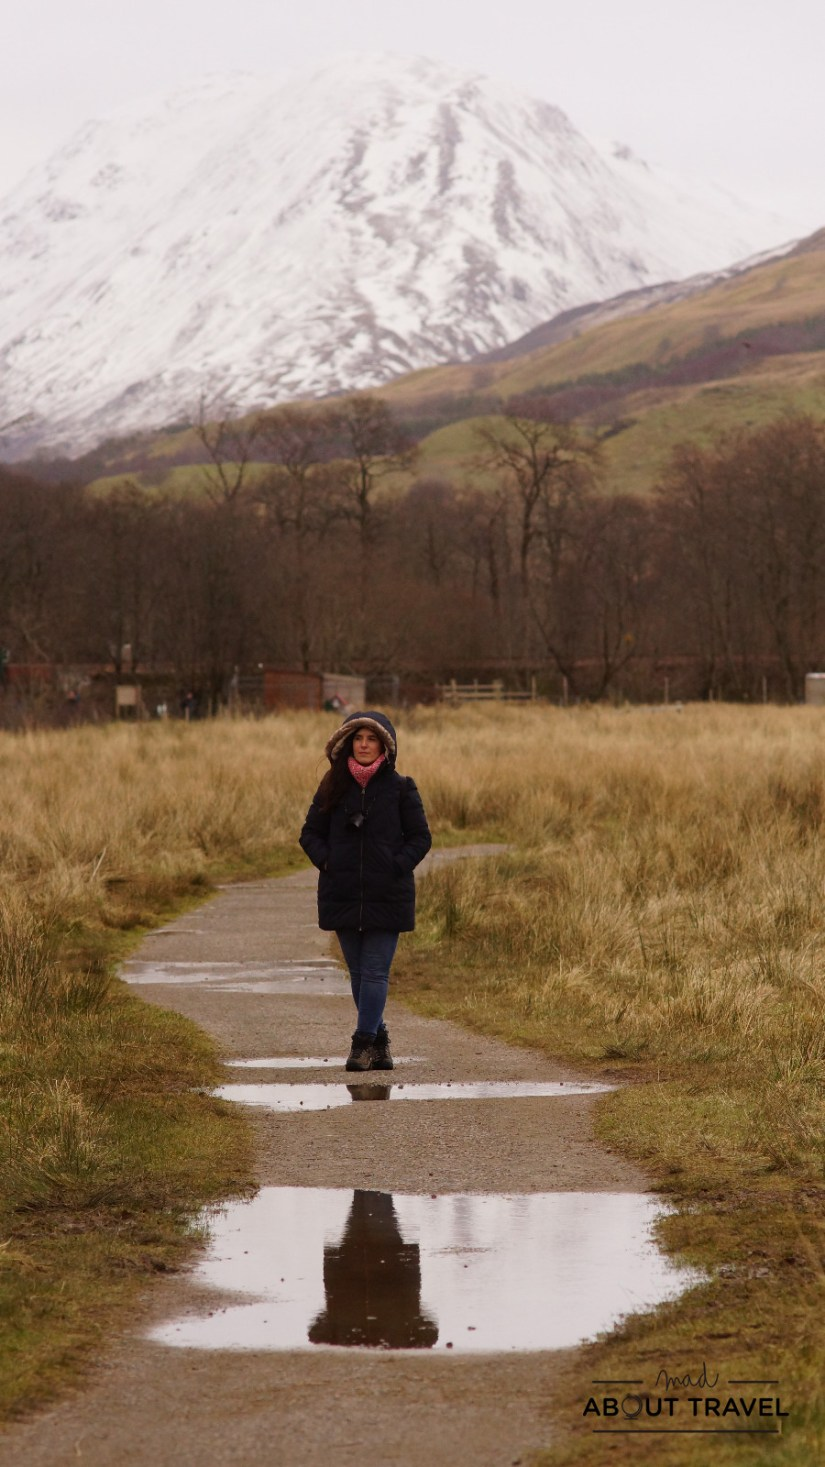 Patricia Cuni de camino al castillo de Kilchurn